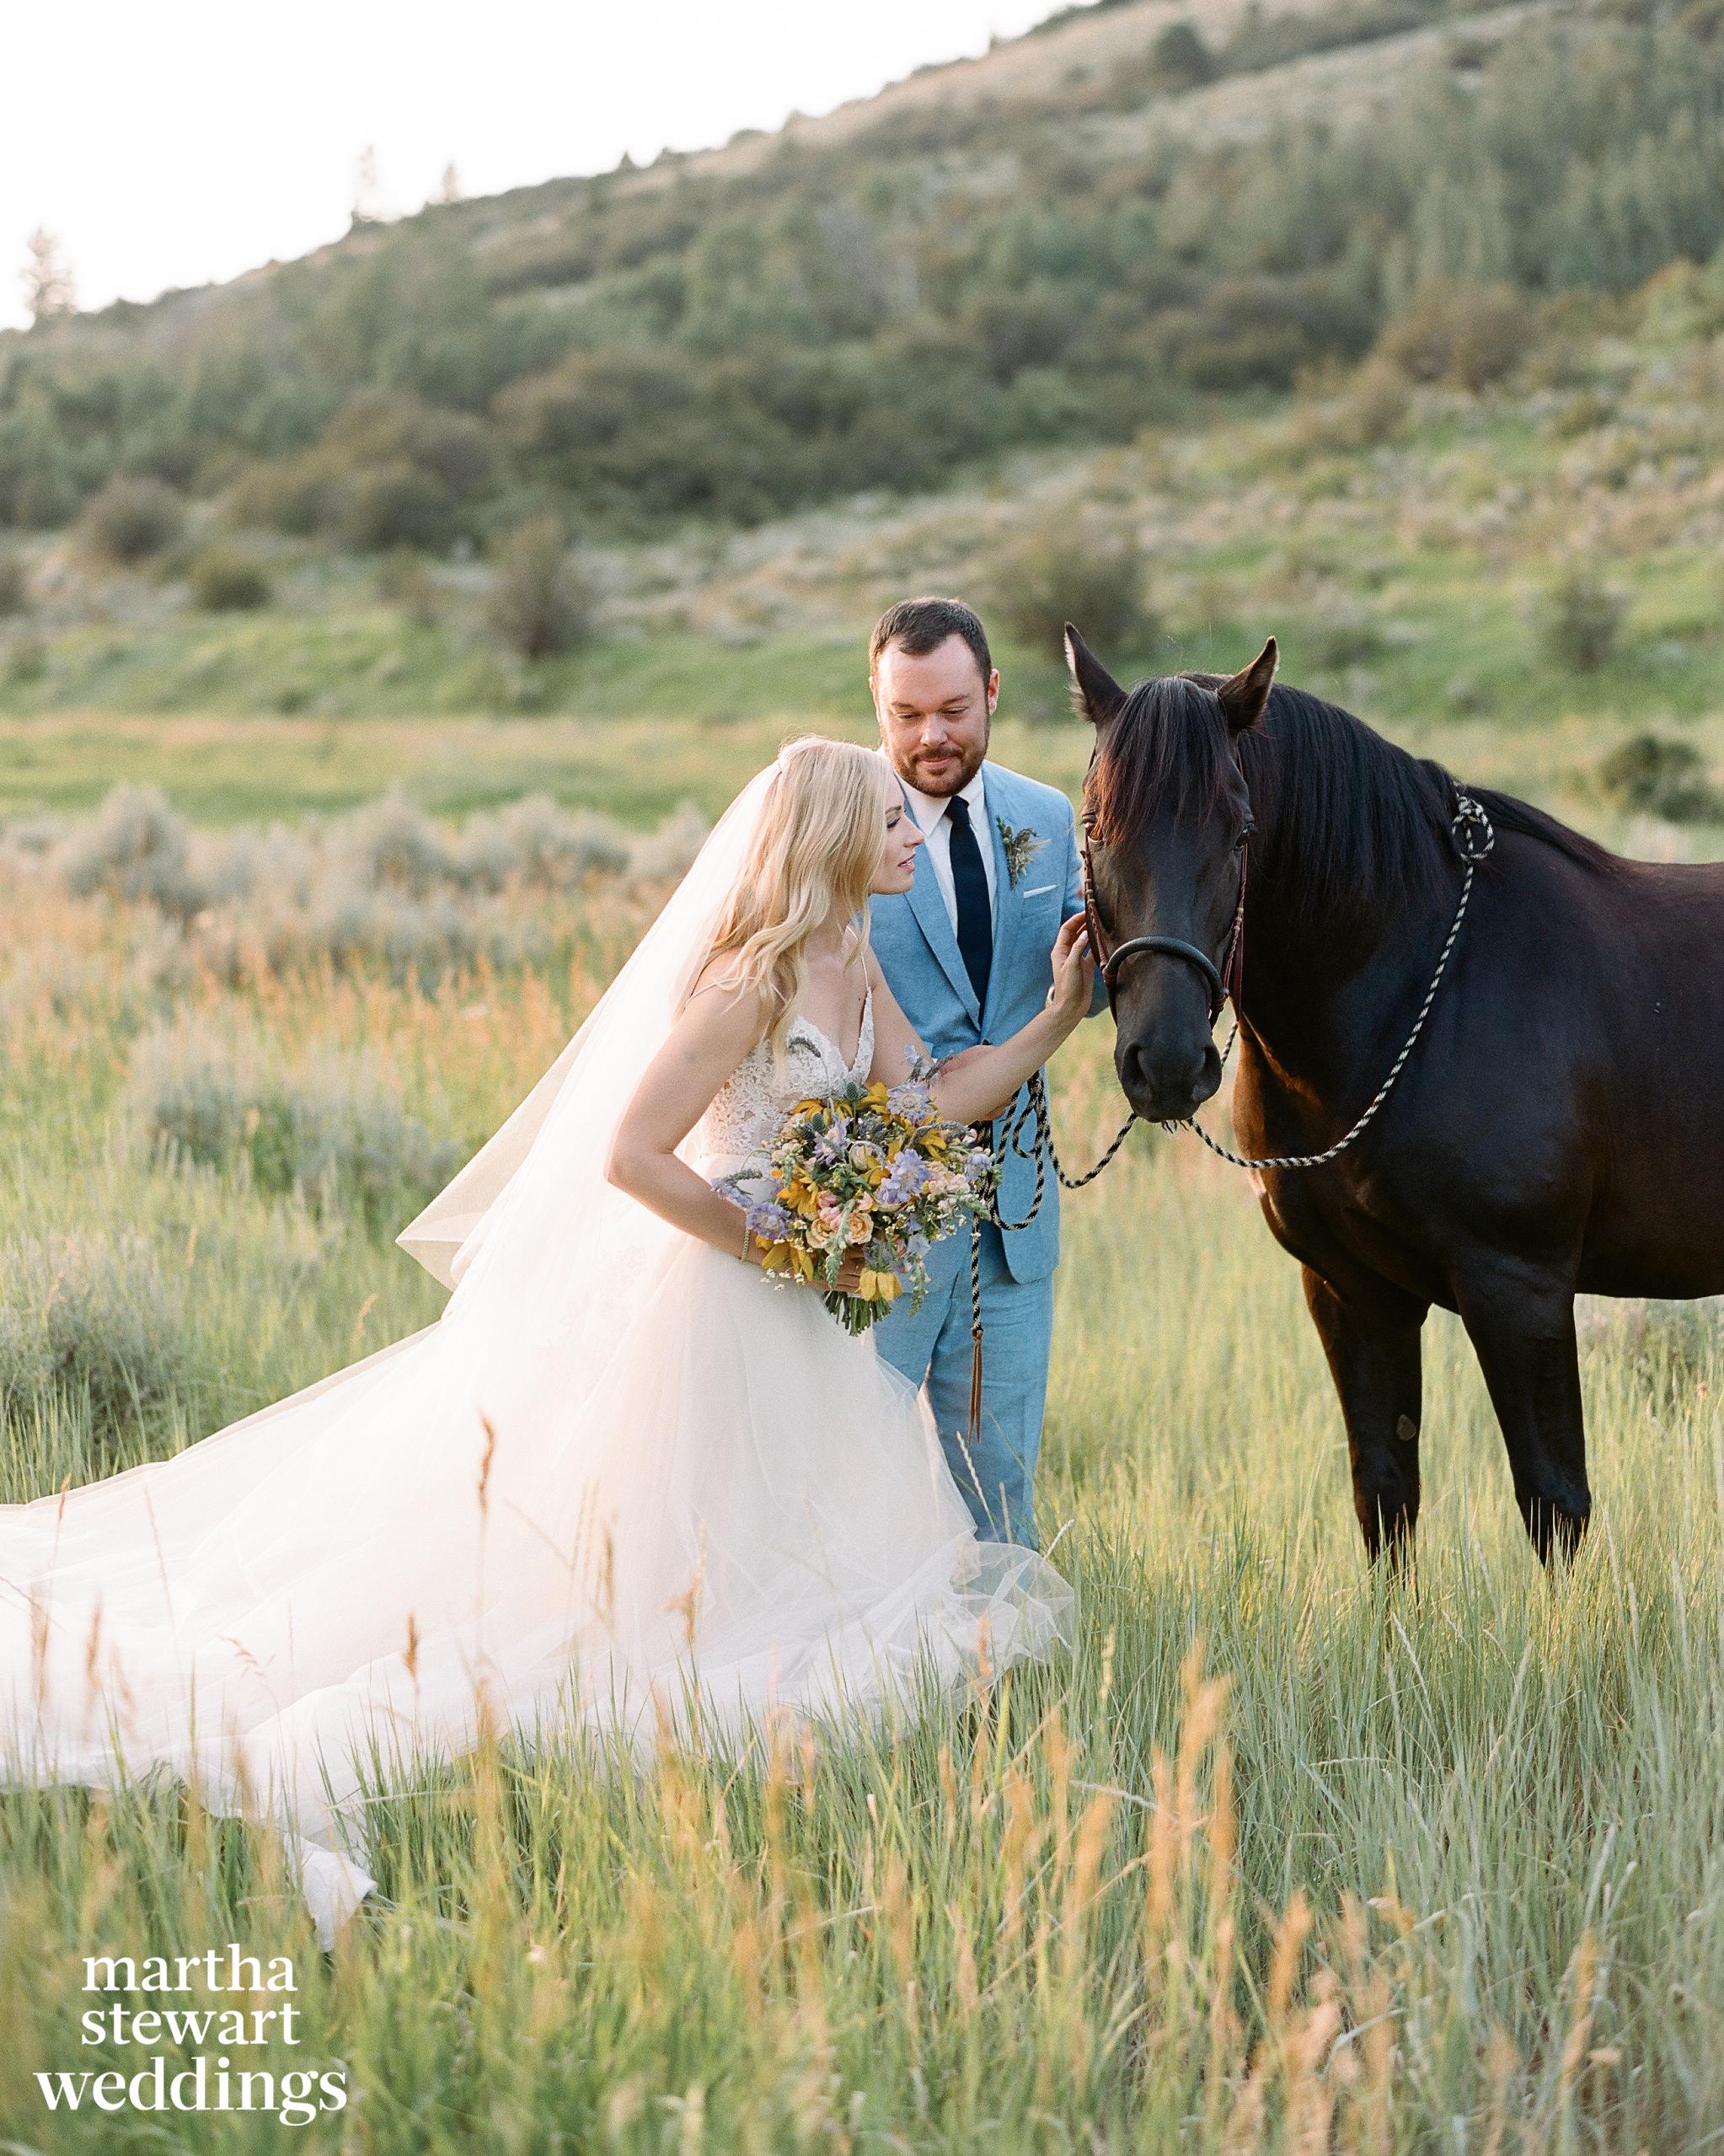 Equestrian bride, equine bridal photography, country wedding, wildhorse and bride, Sylvie Gil Photography